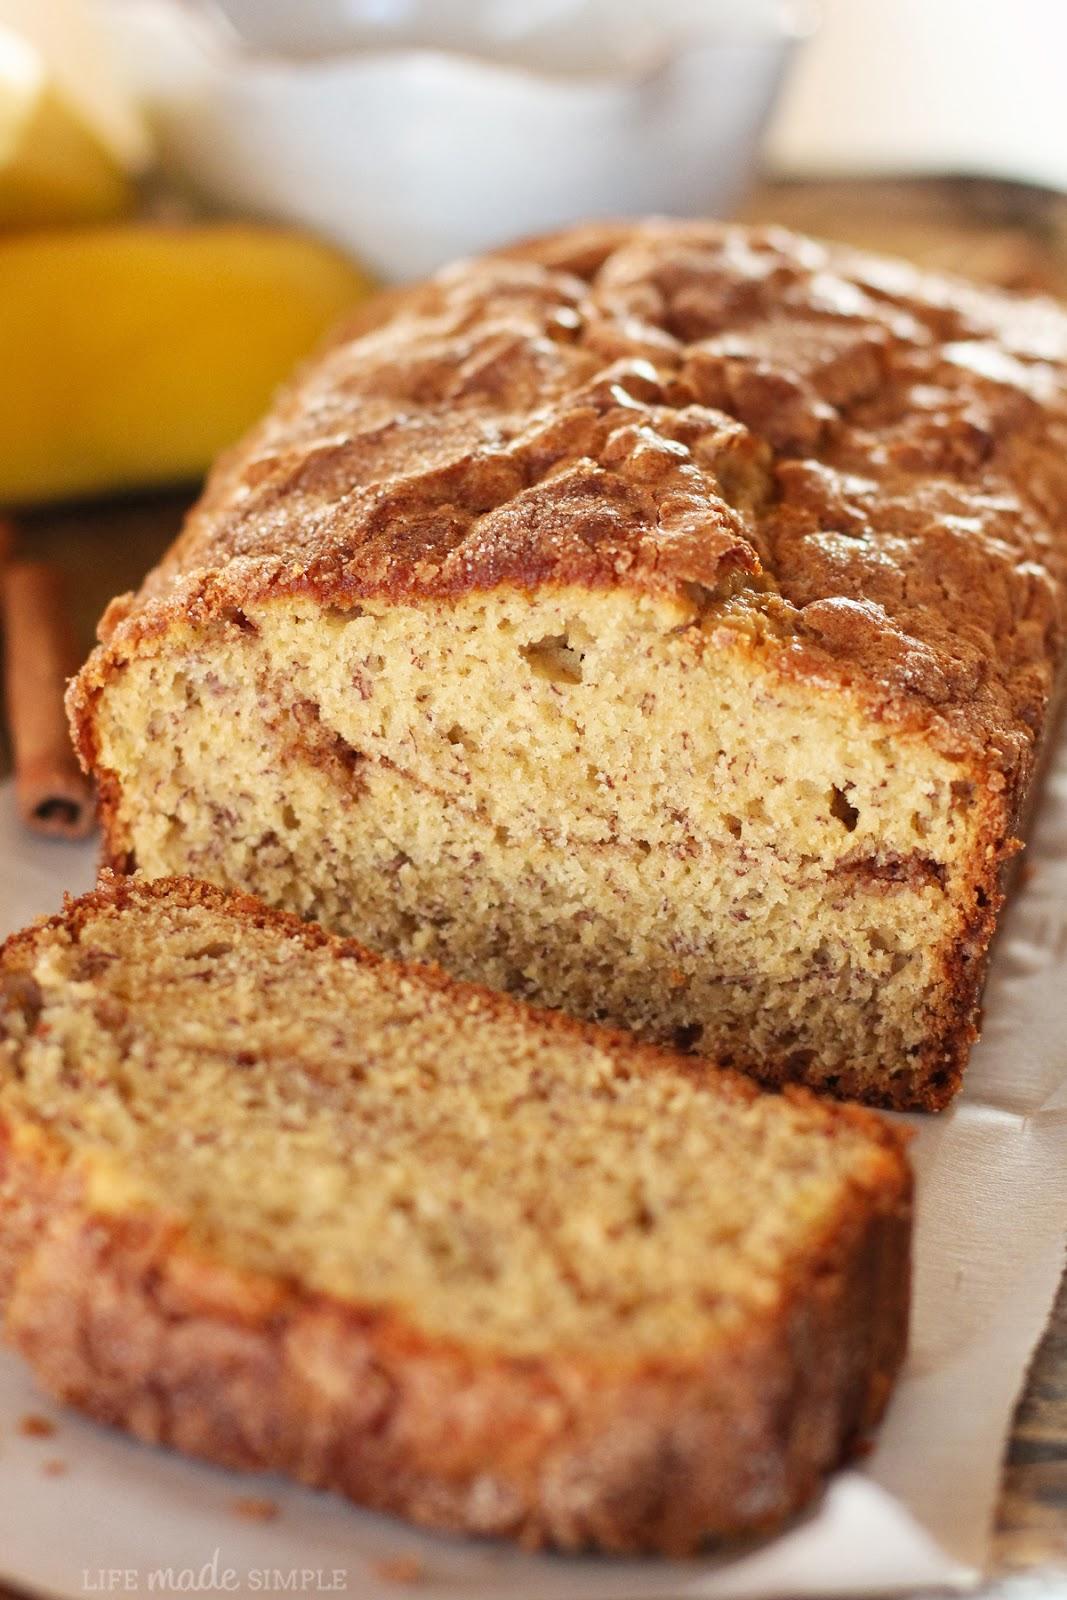 Cinnamon Sugar Topped Banana Bread